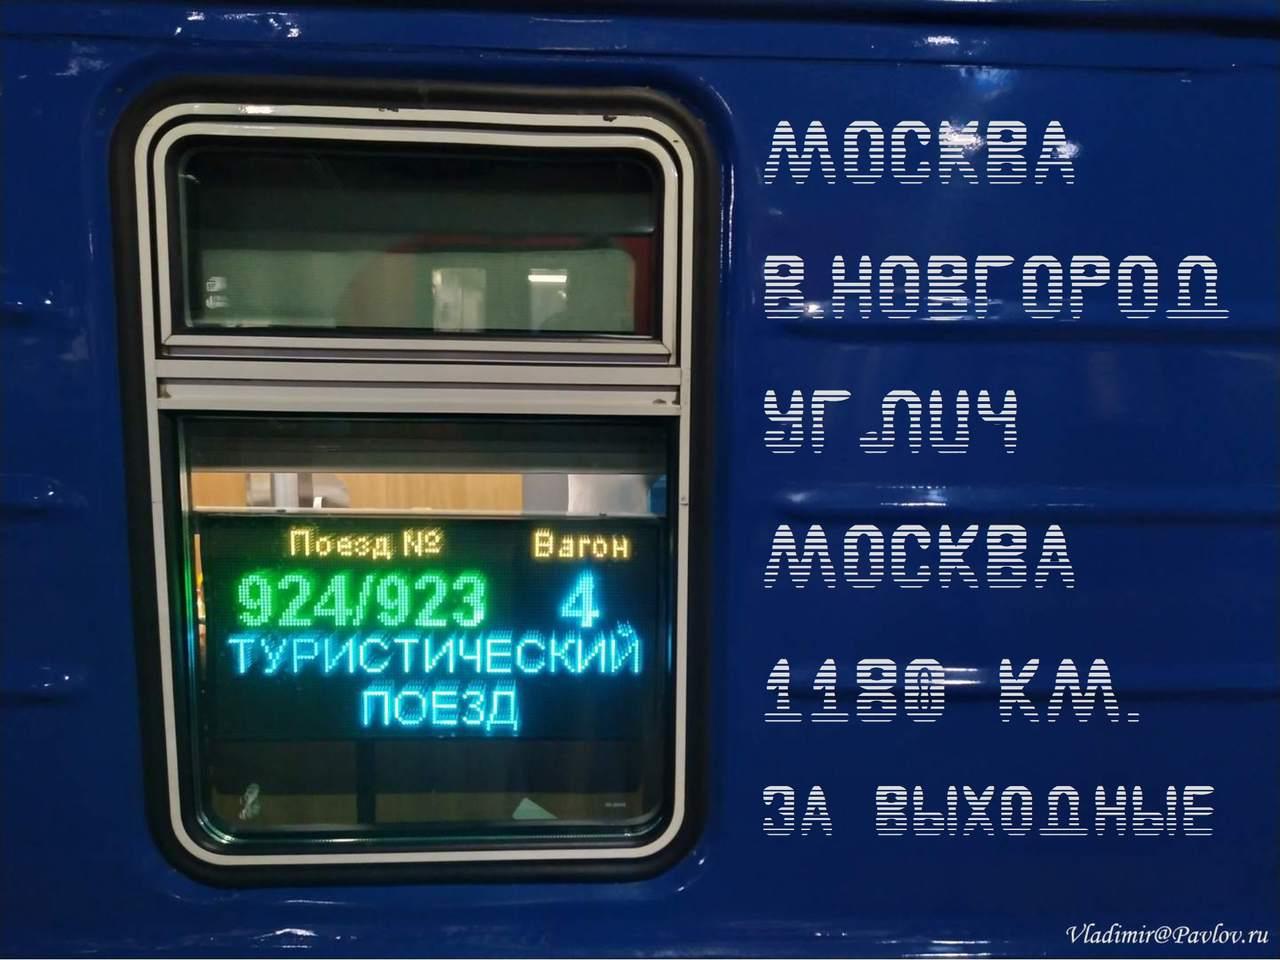 Tur na poezde 924 923 Moskva Velikij Novgorod Uglich - Туристический поезд Москва – В. Новгород – Углич – Москва. Отчет и отзывы